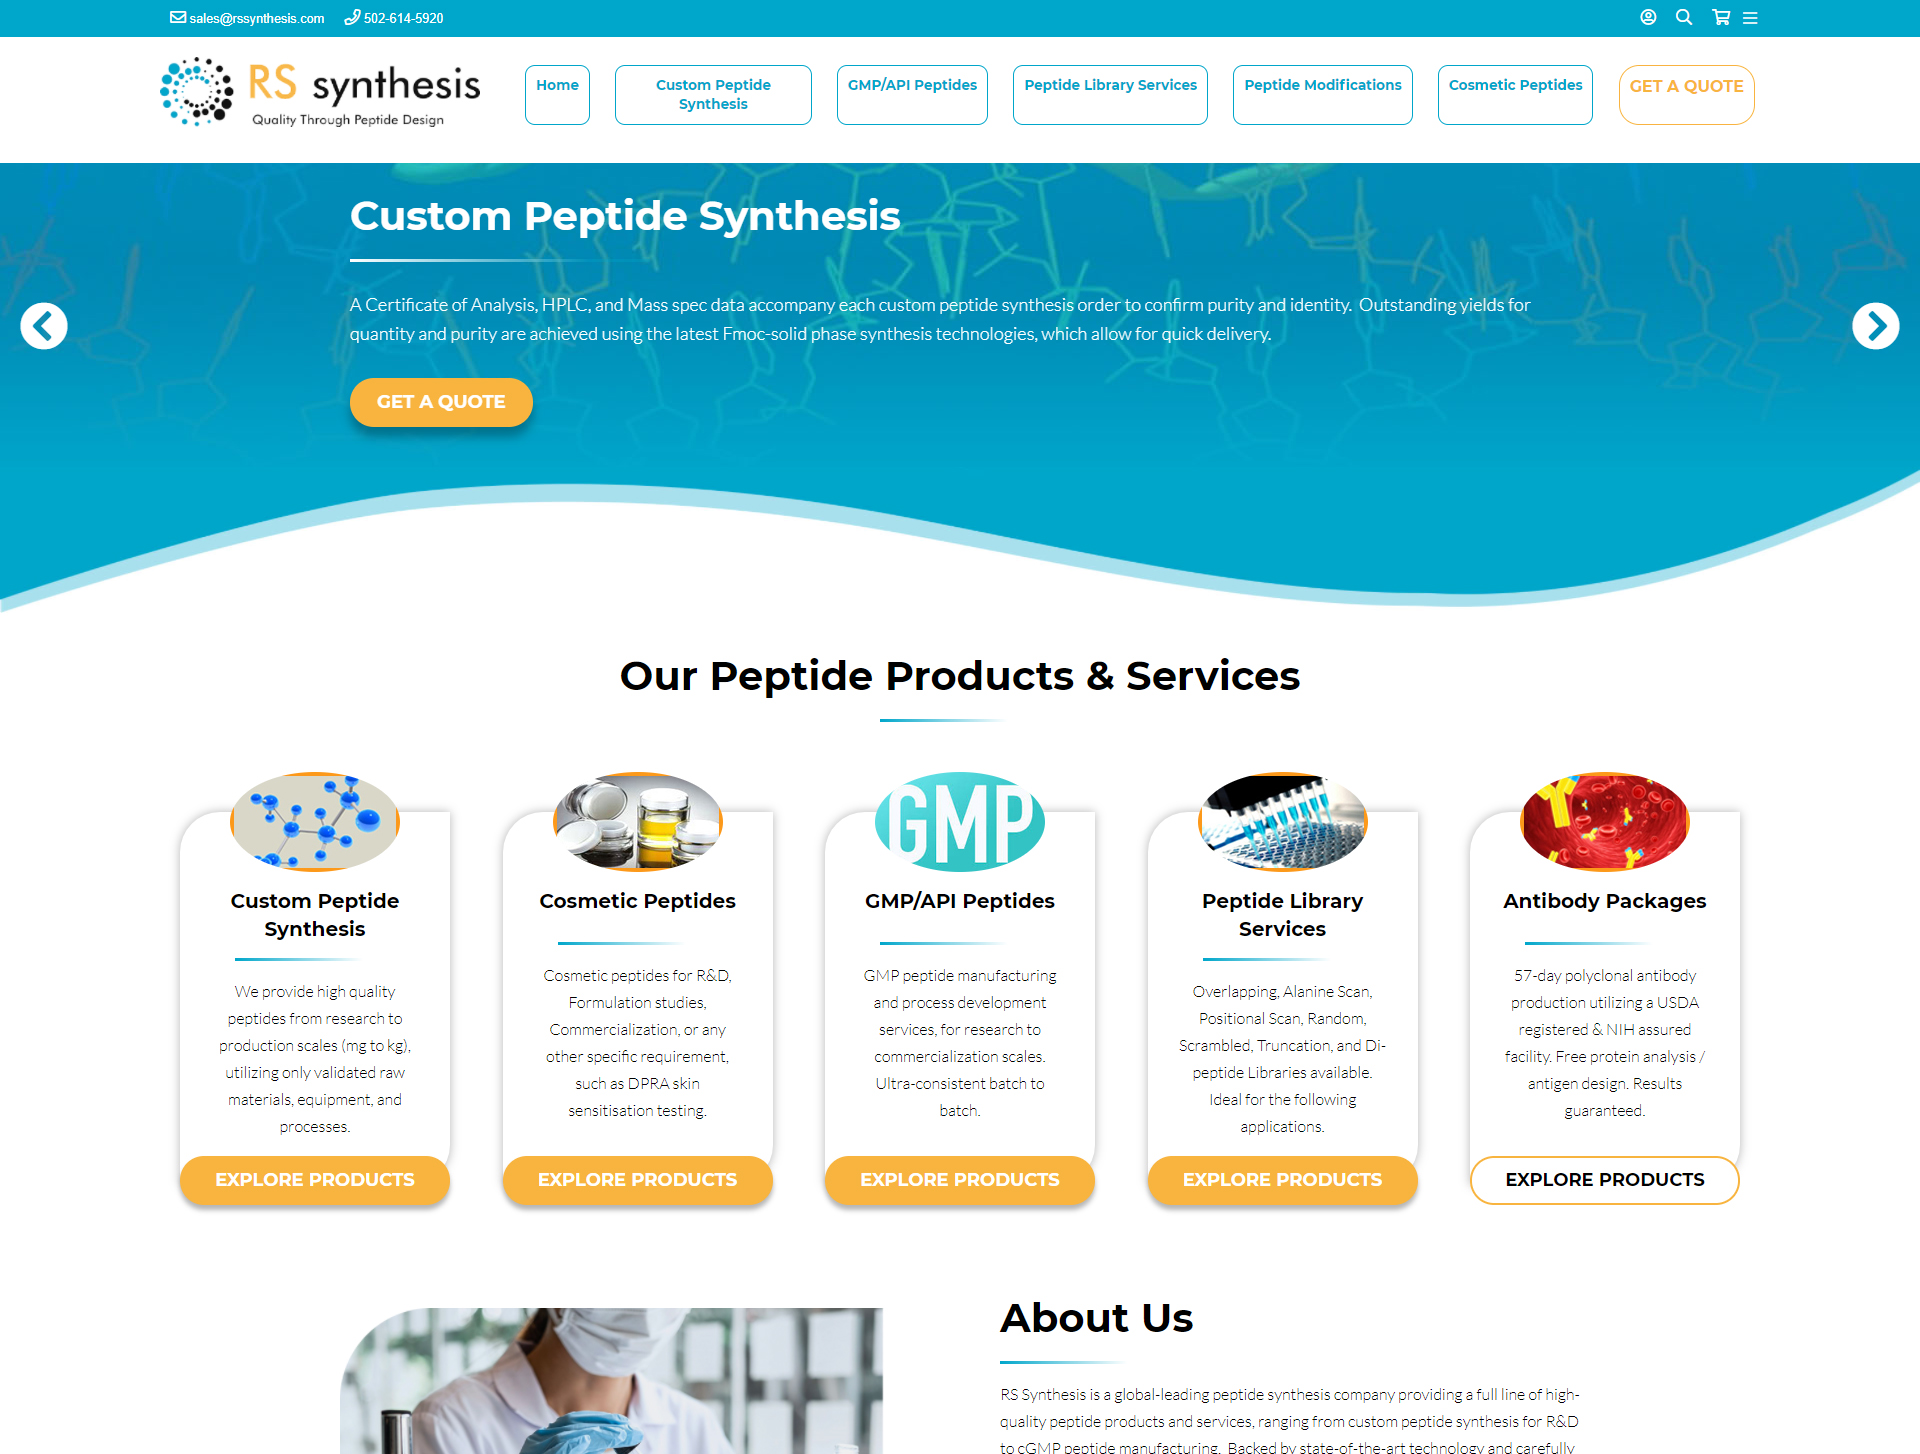 Rs Synthesis portfolio image